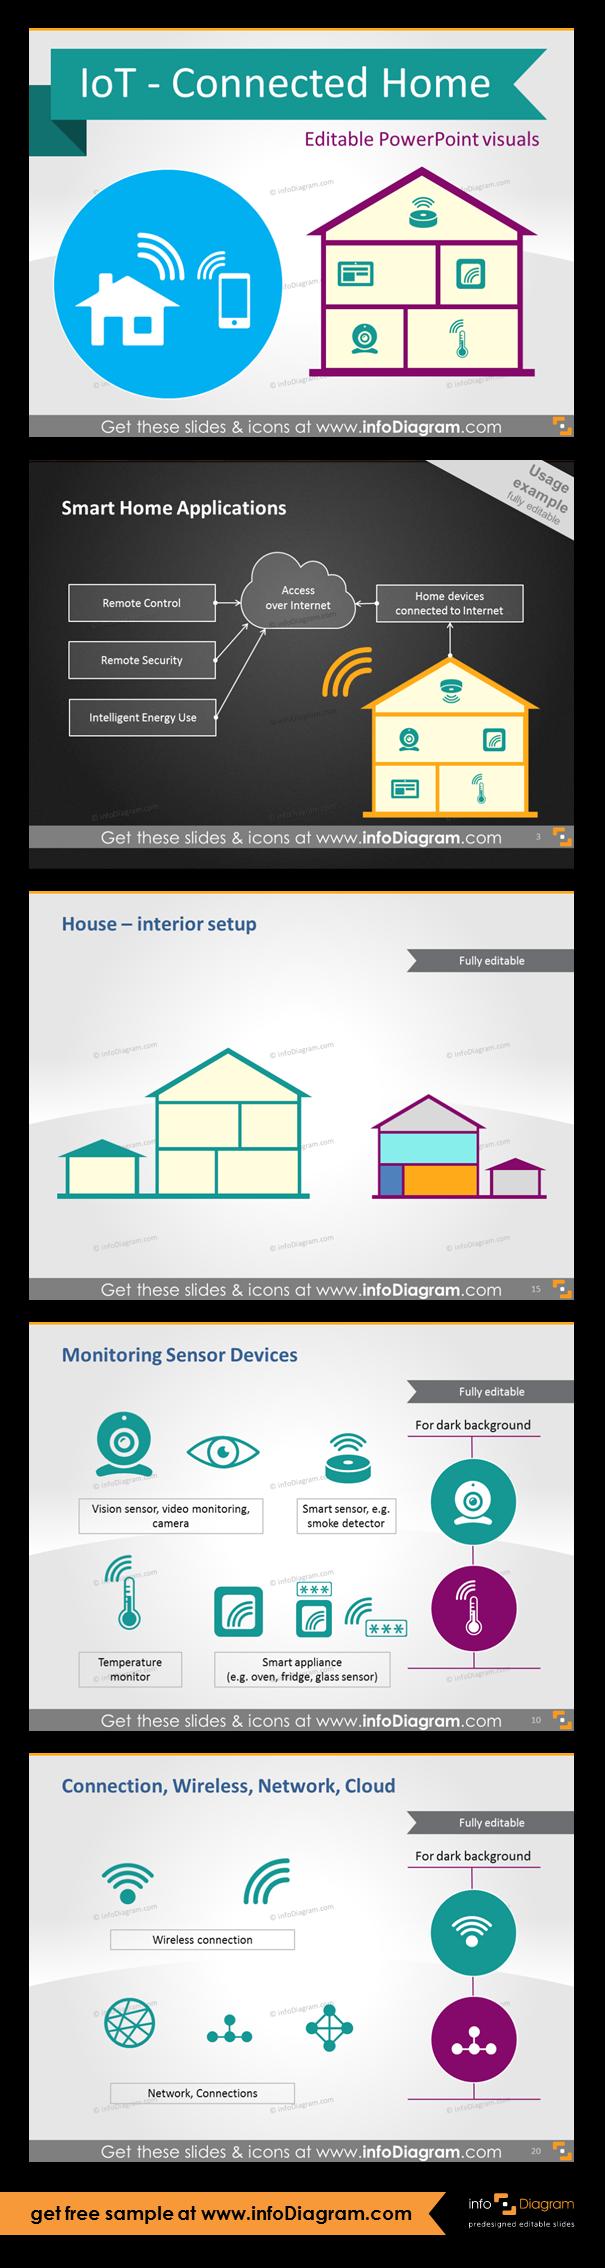 Iot Connected Home Graphics House Interior Setup Editable Monitoring Sensors Device Vision Sensor Video Monitoring Camera Smart Sensor Smoke Detecto